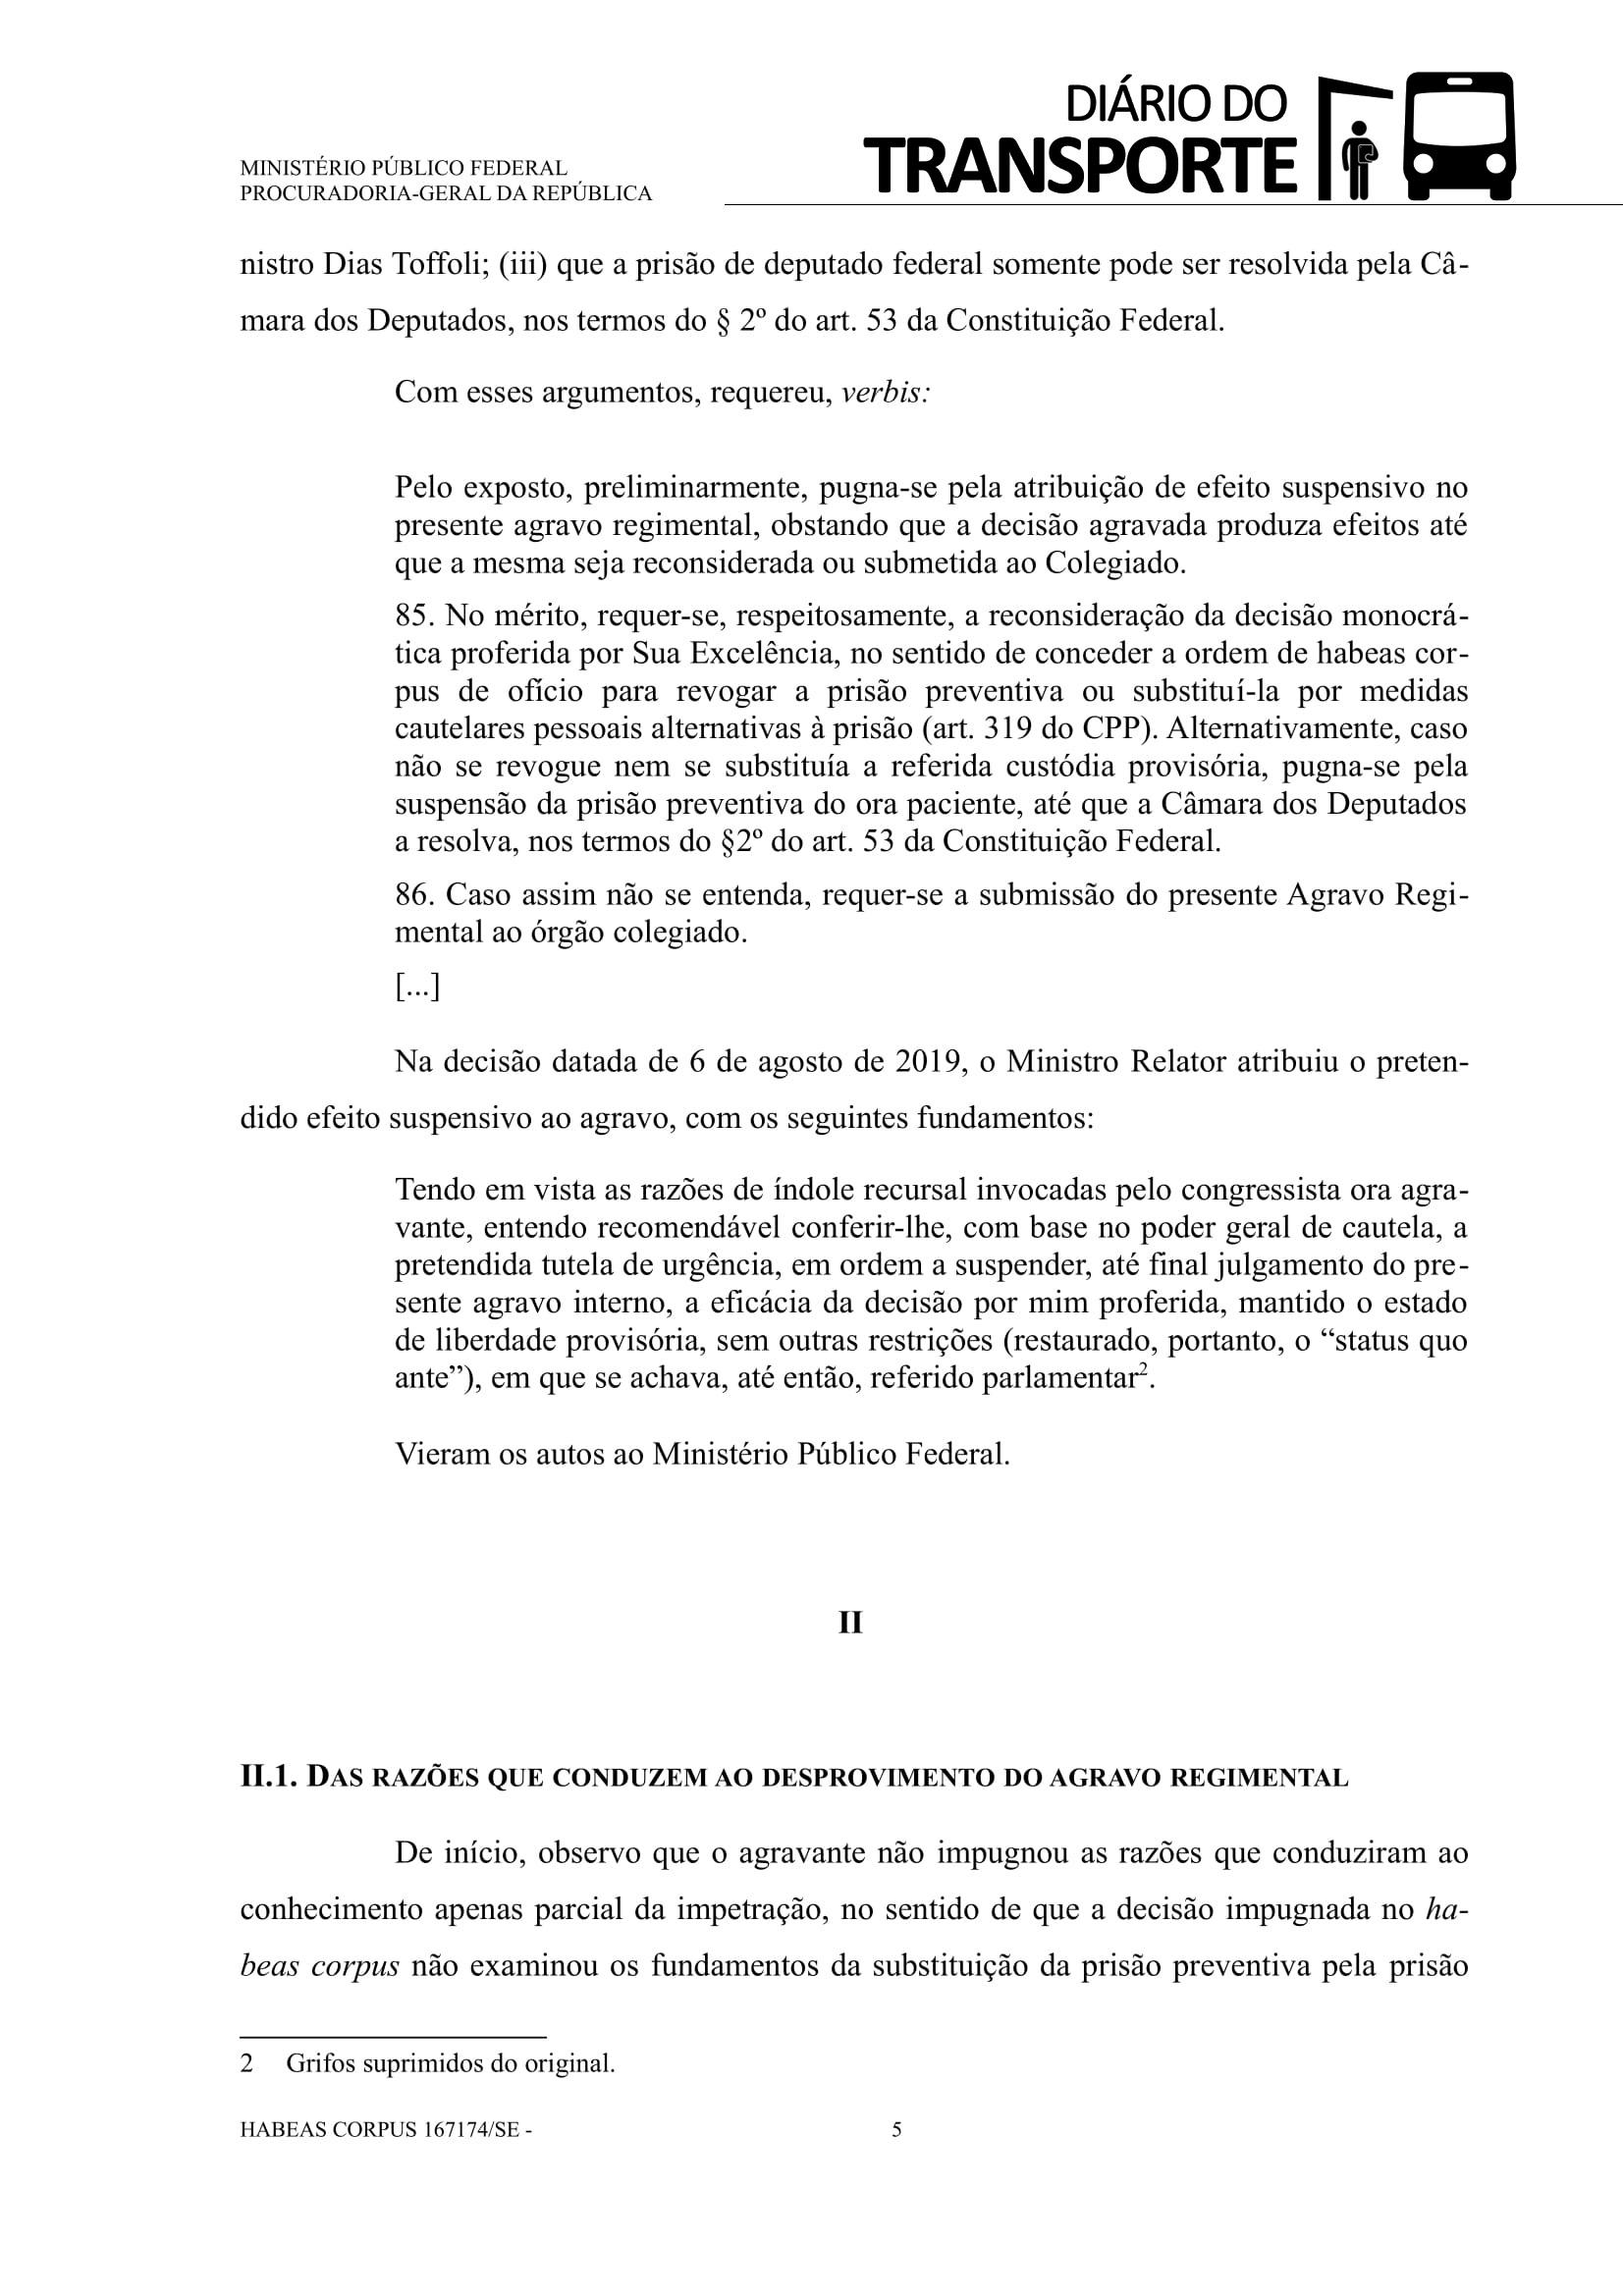 HC 167174_ContrarrazoesAgravo_Jose Valdevan de Jesus Santos-05